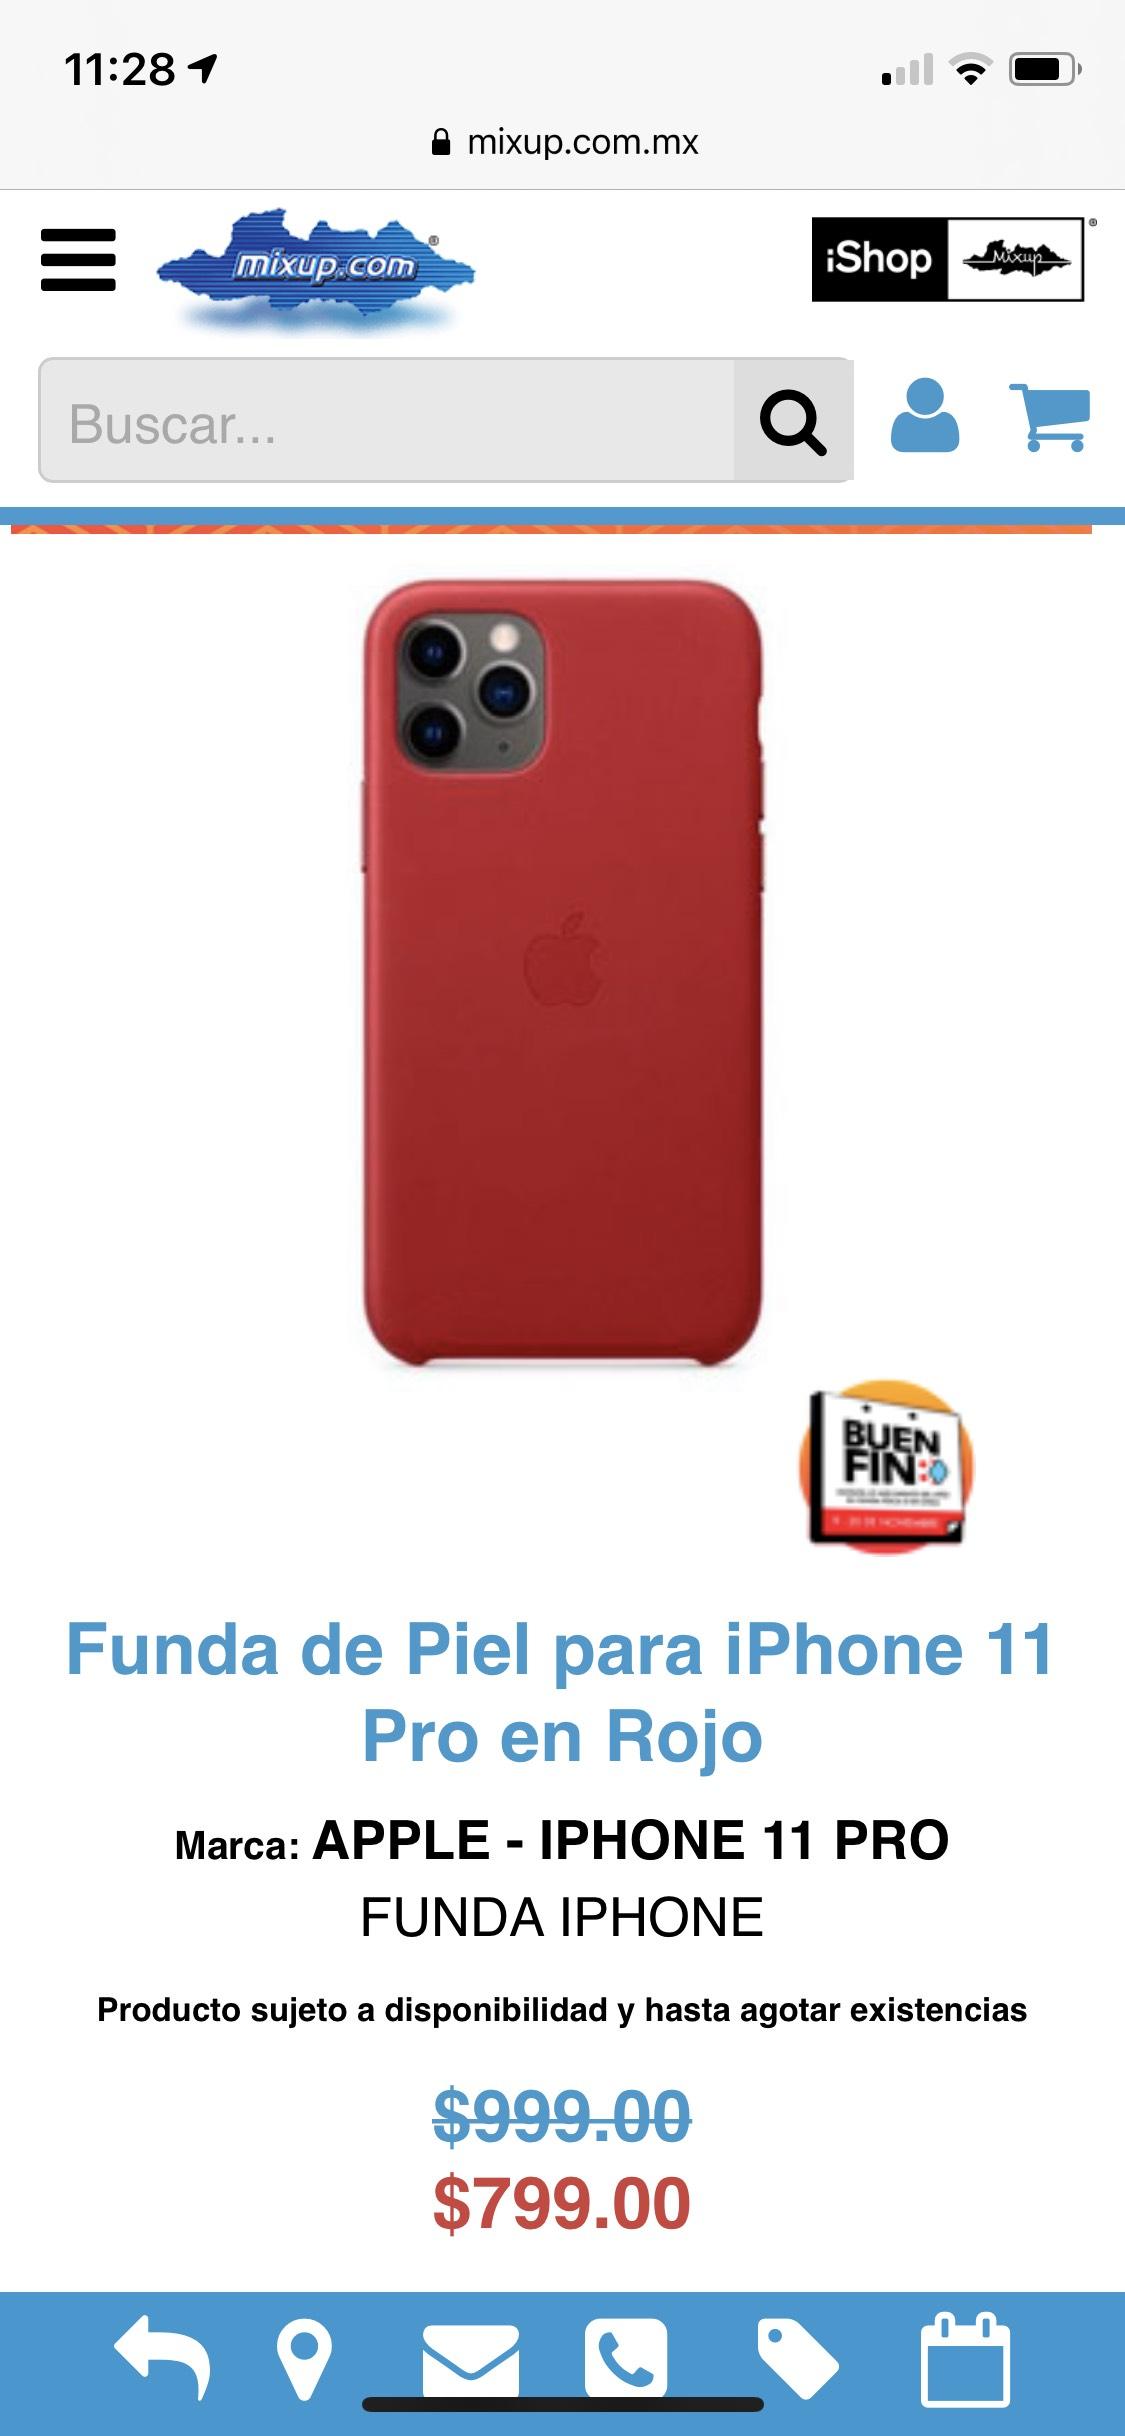 Mixup: Funda piel Apple IPhone 11 Pro